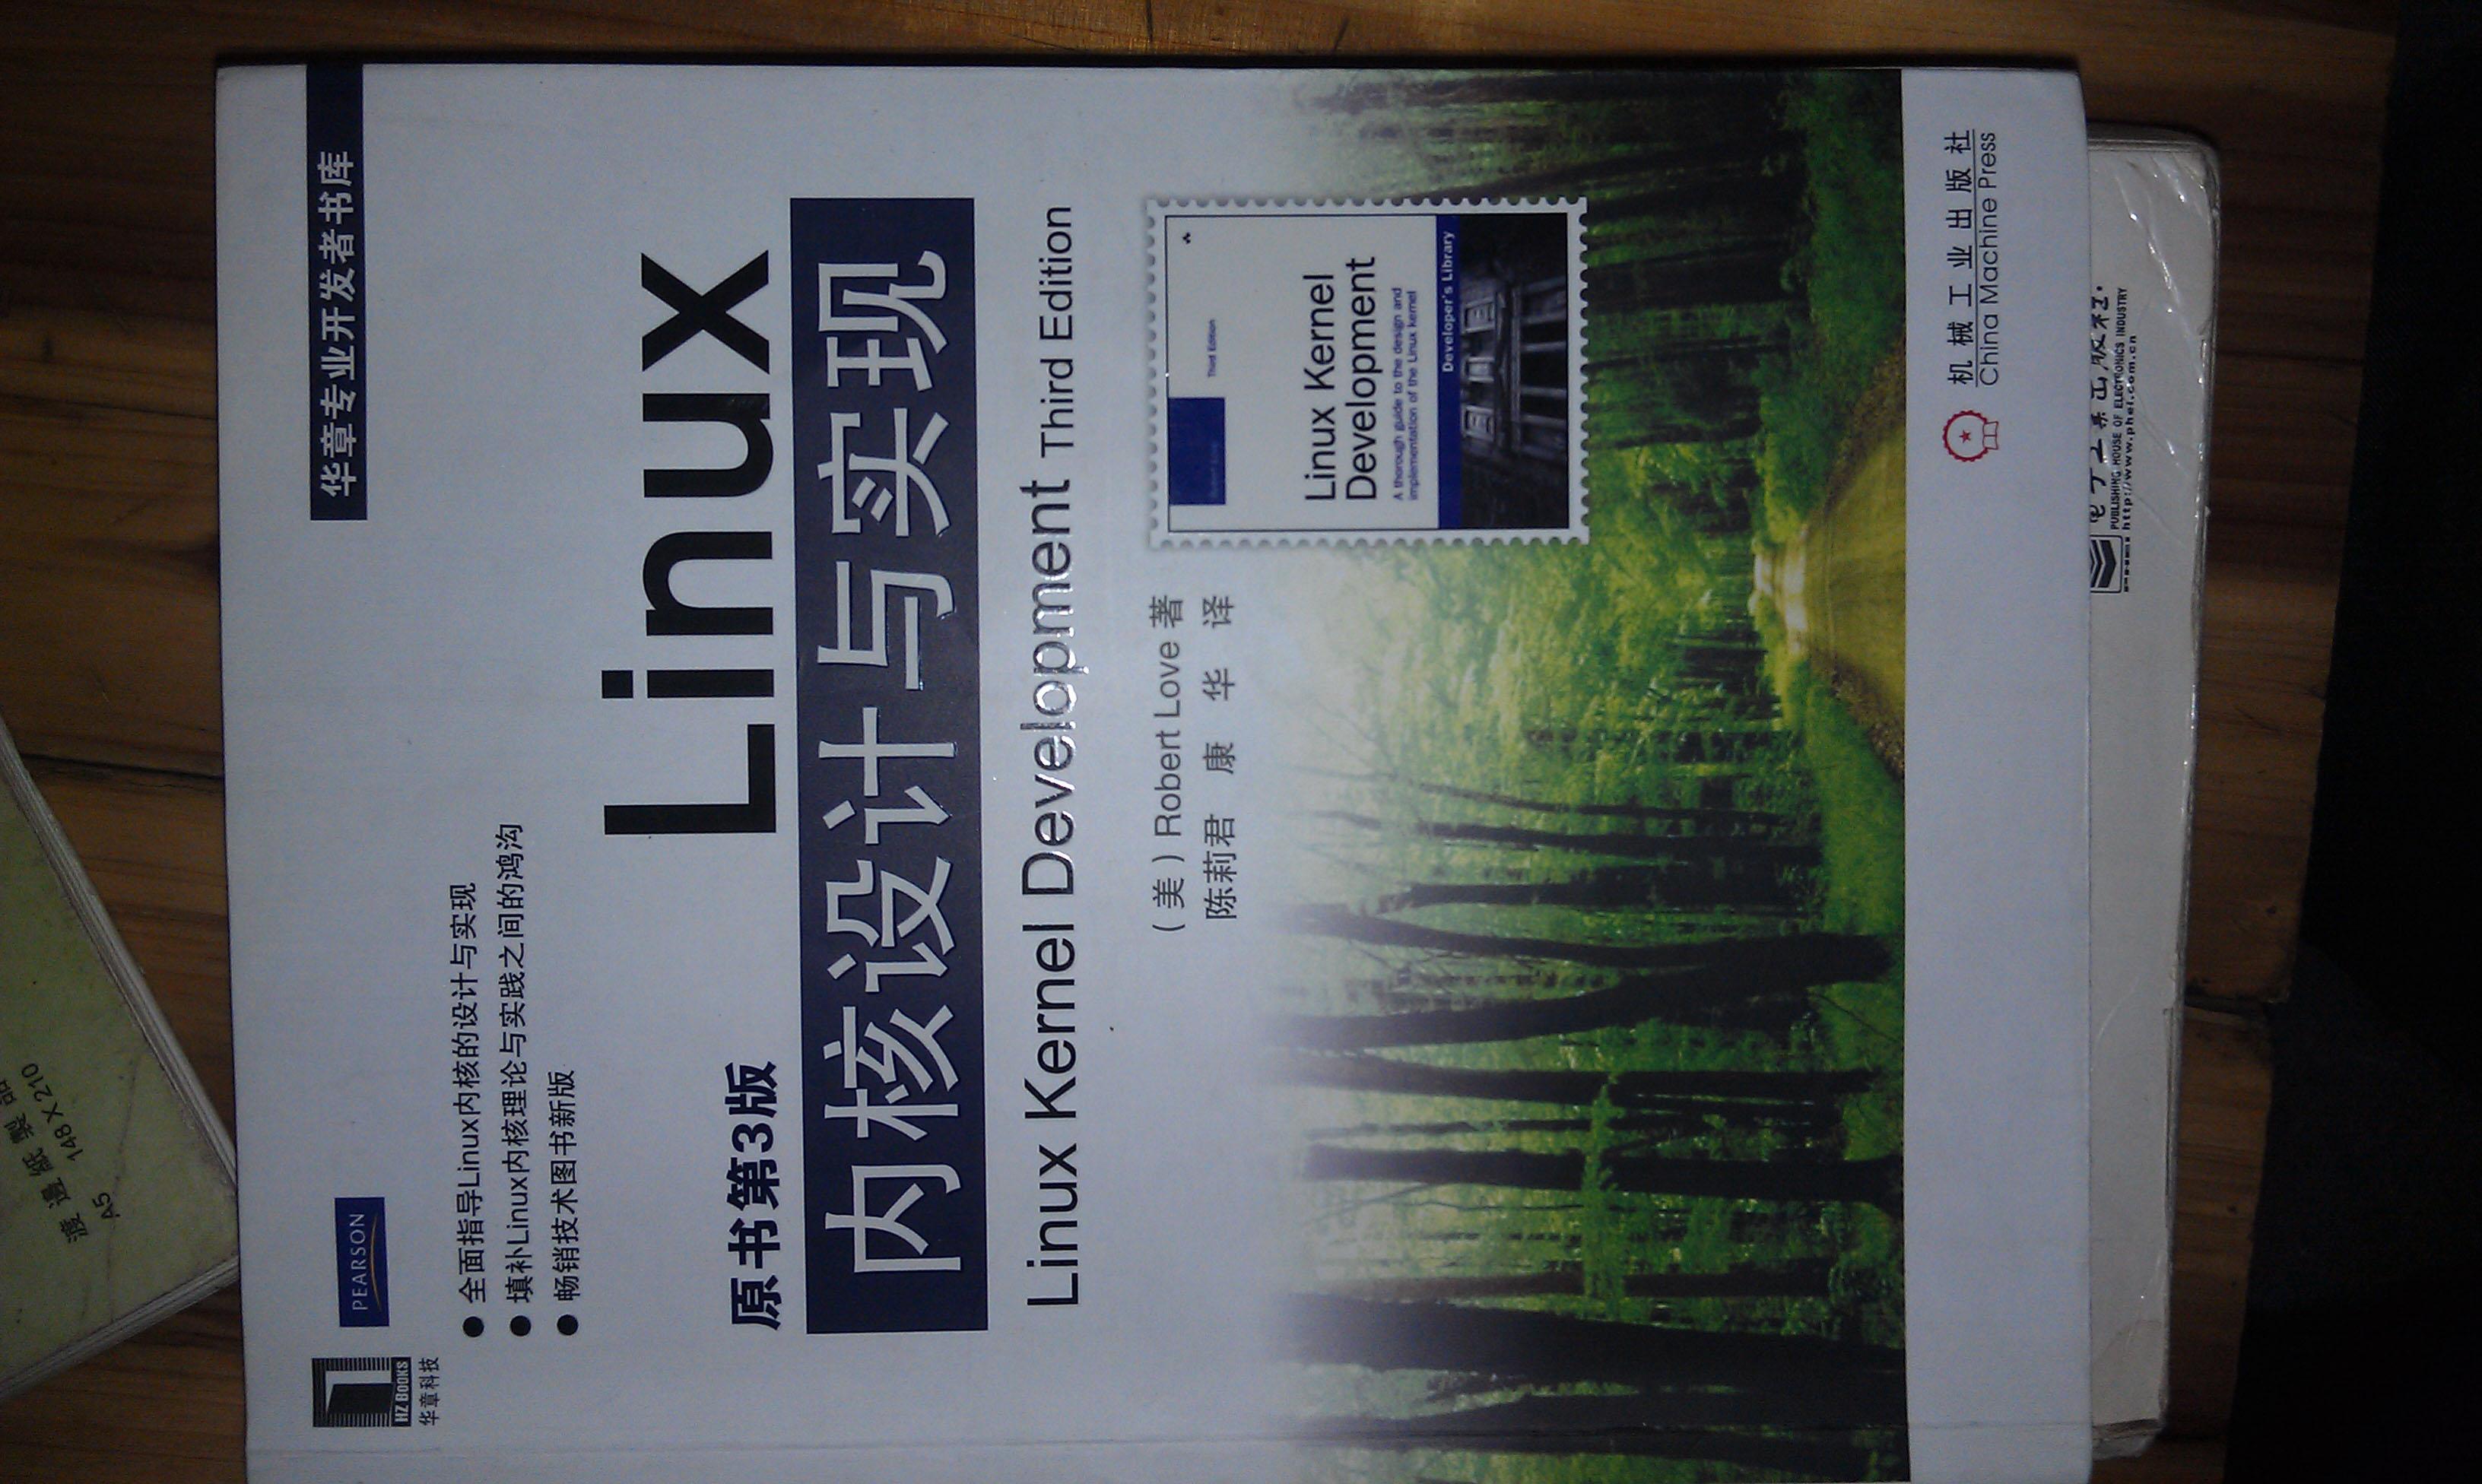 linux_kernal